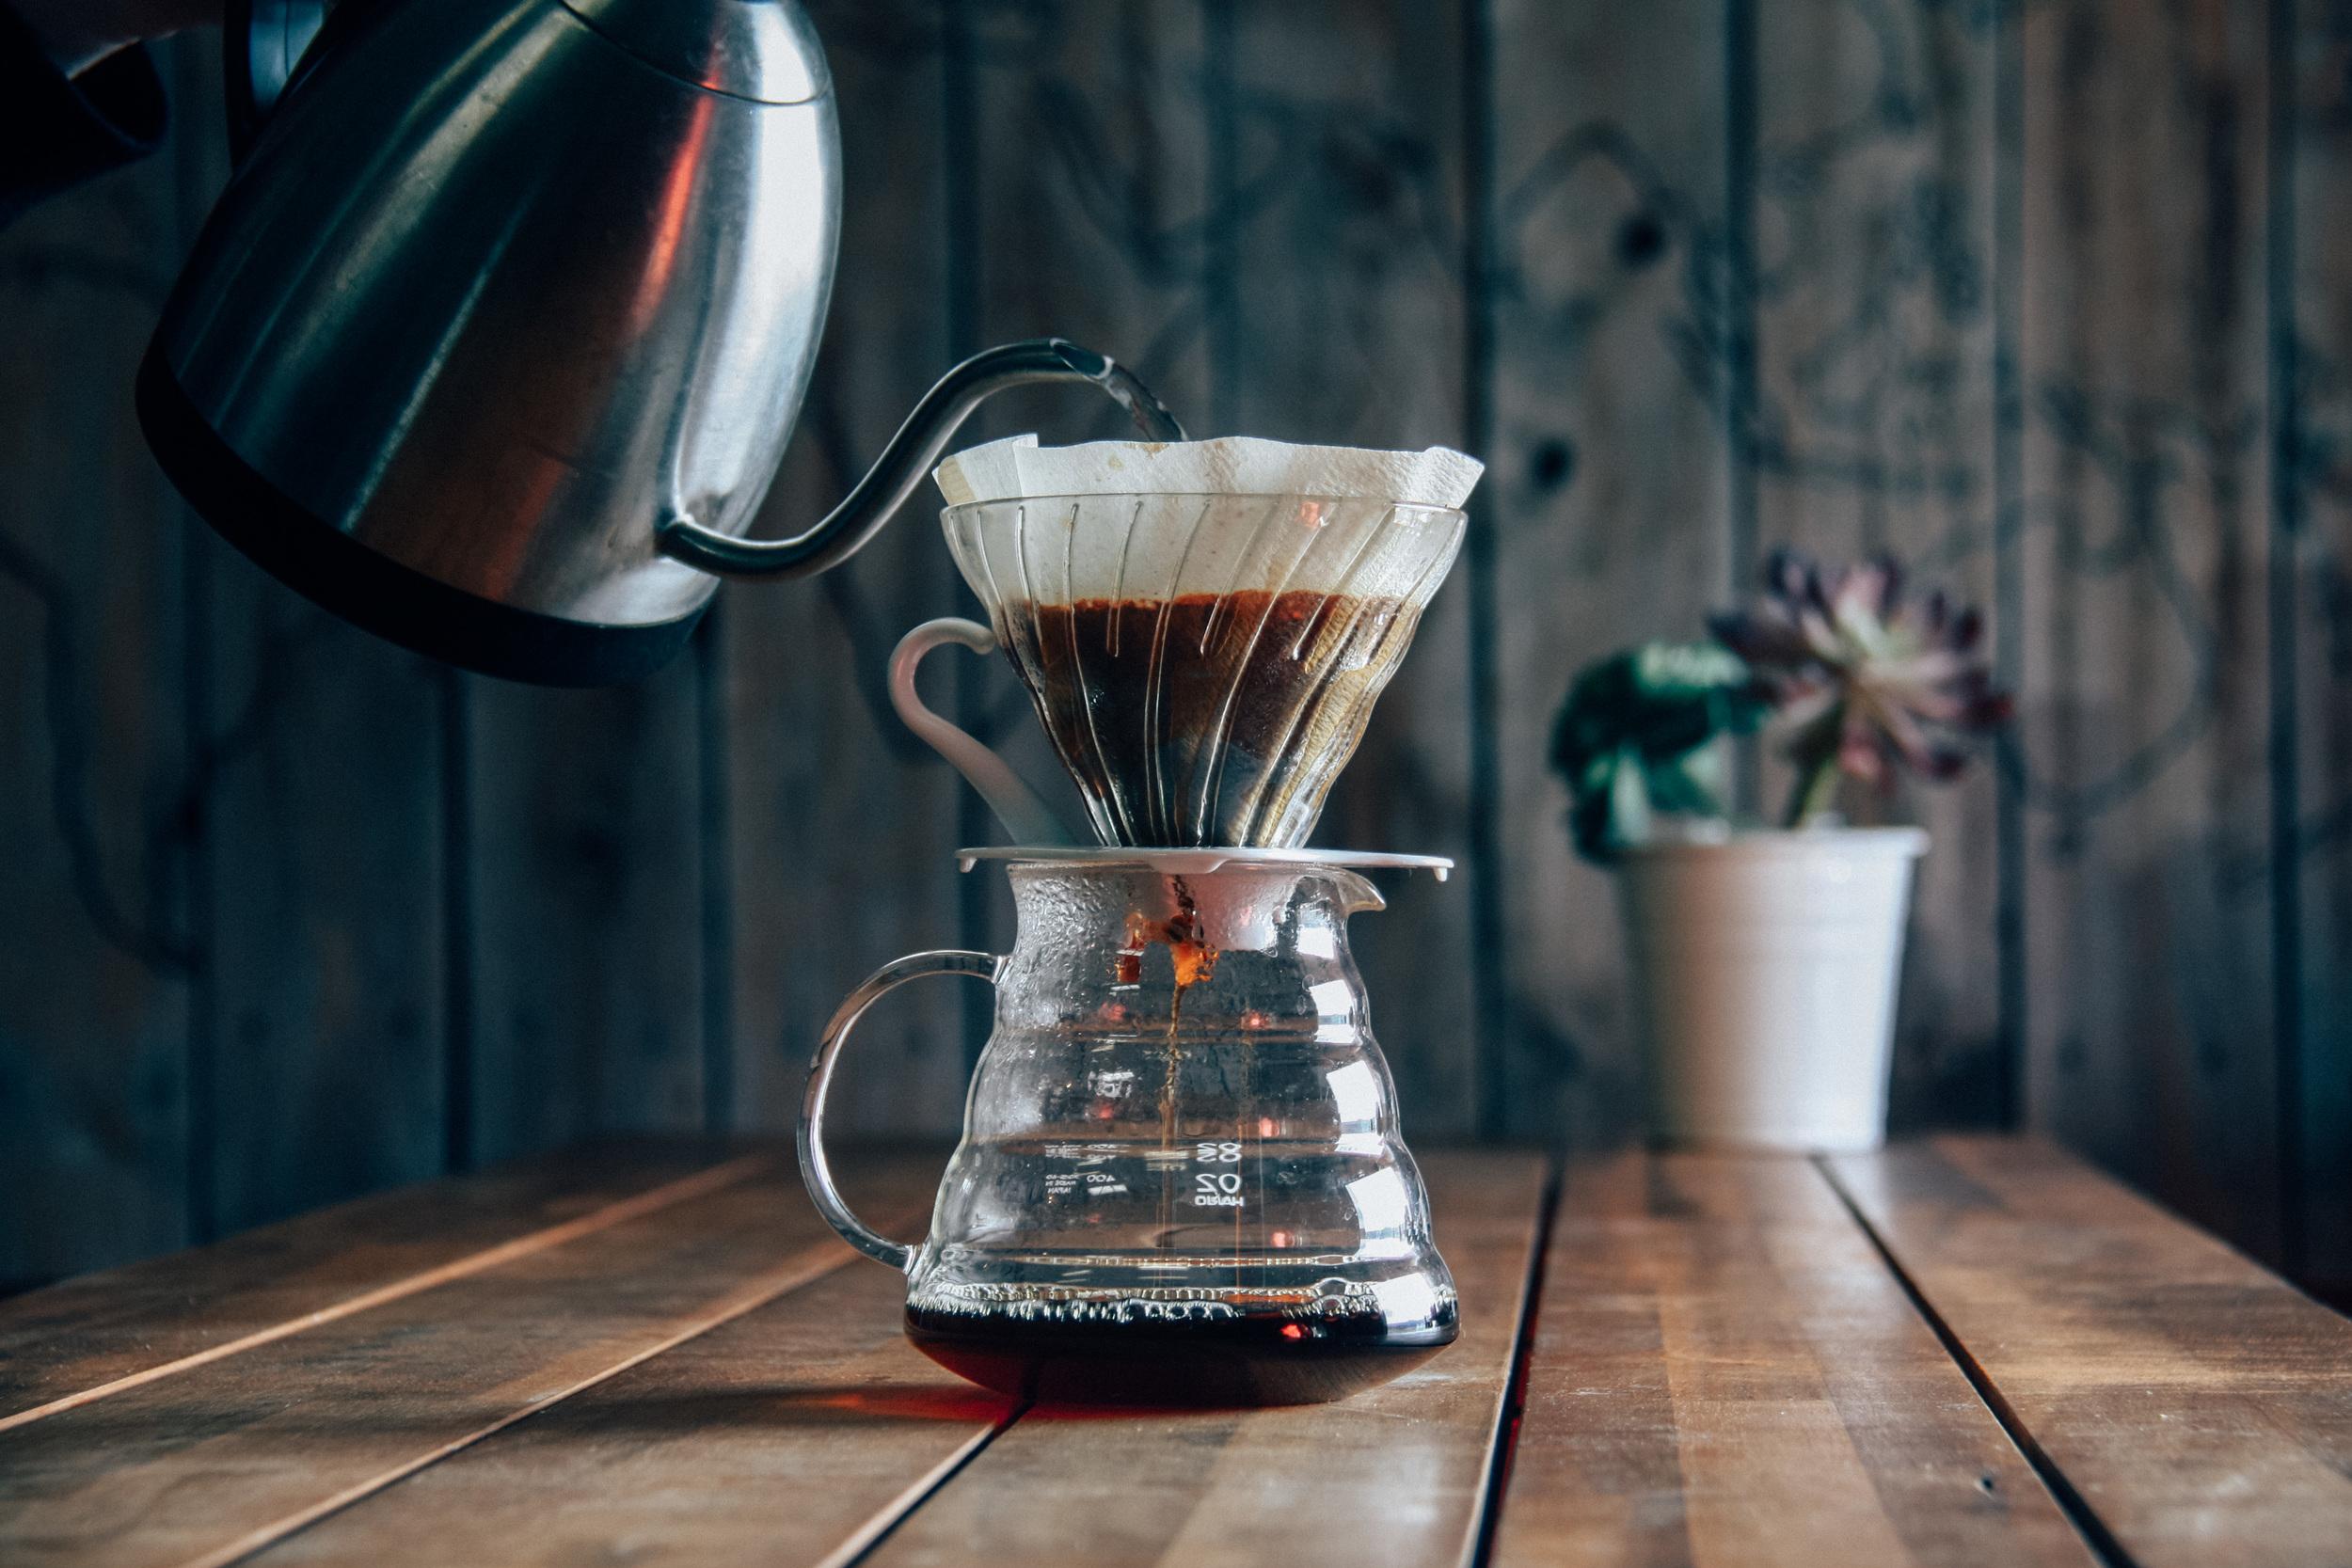 treeline-coffee-roasters-bozeman-coffee-sourcing